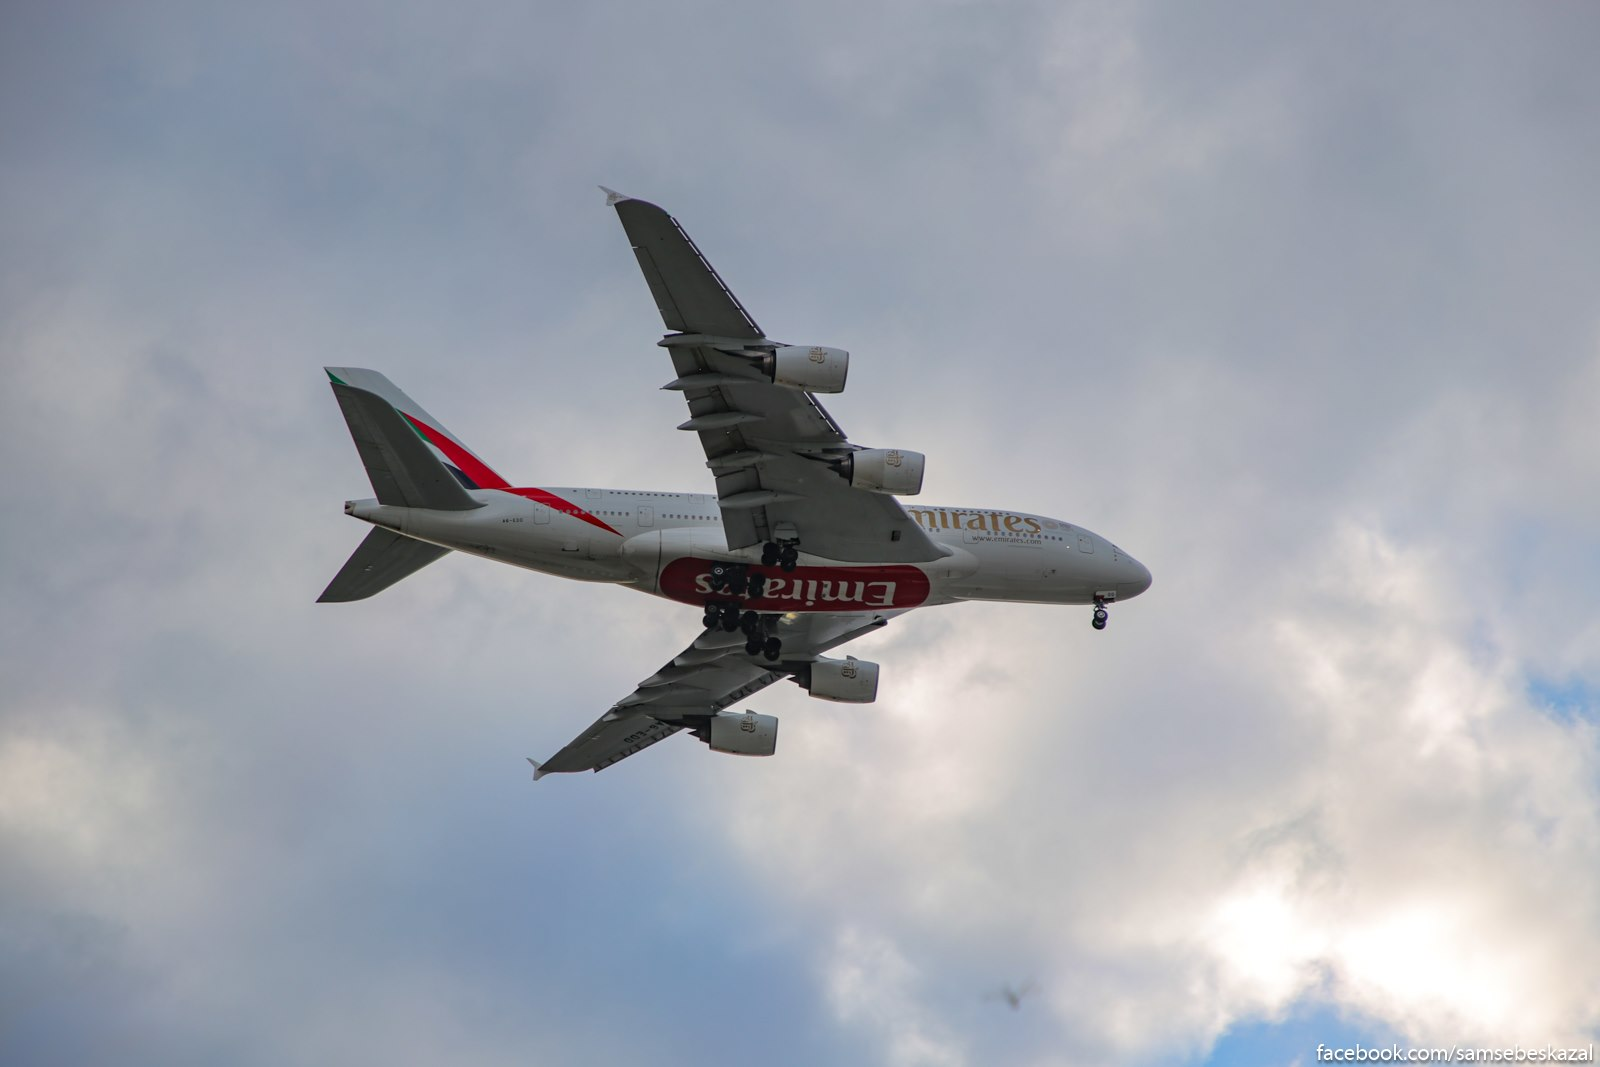 Airbus A380 zahodit na posadku nad plazem Rokavej, Kuins. Zdorovaa takaa bandurencia.